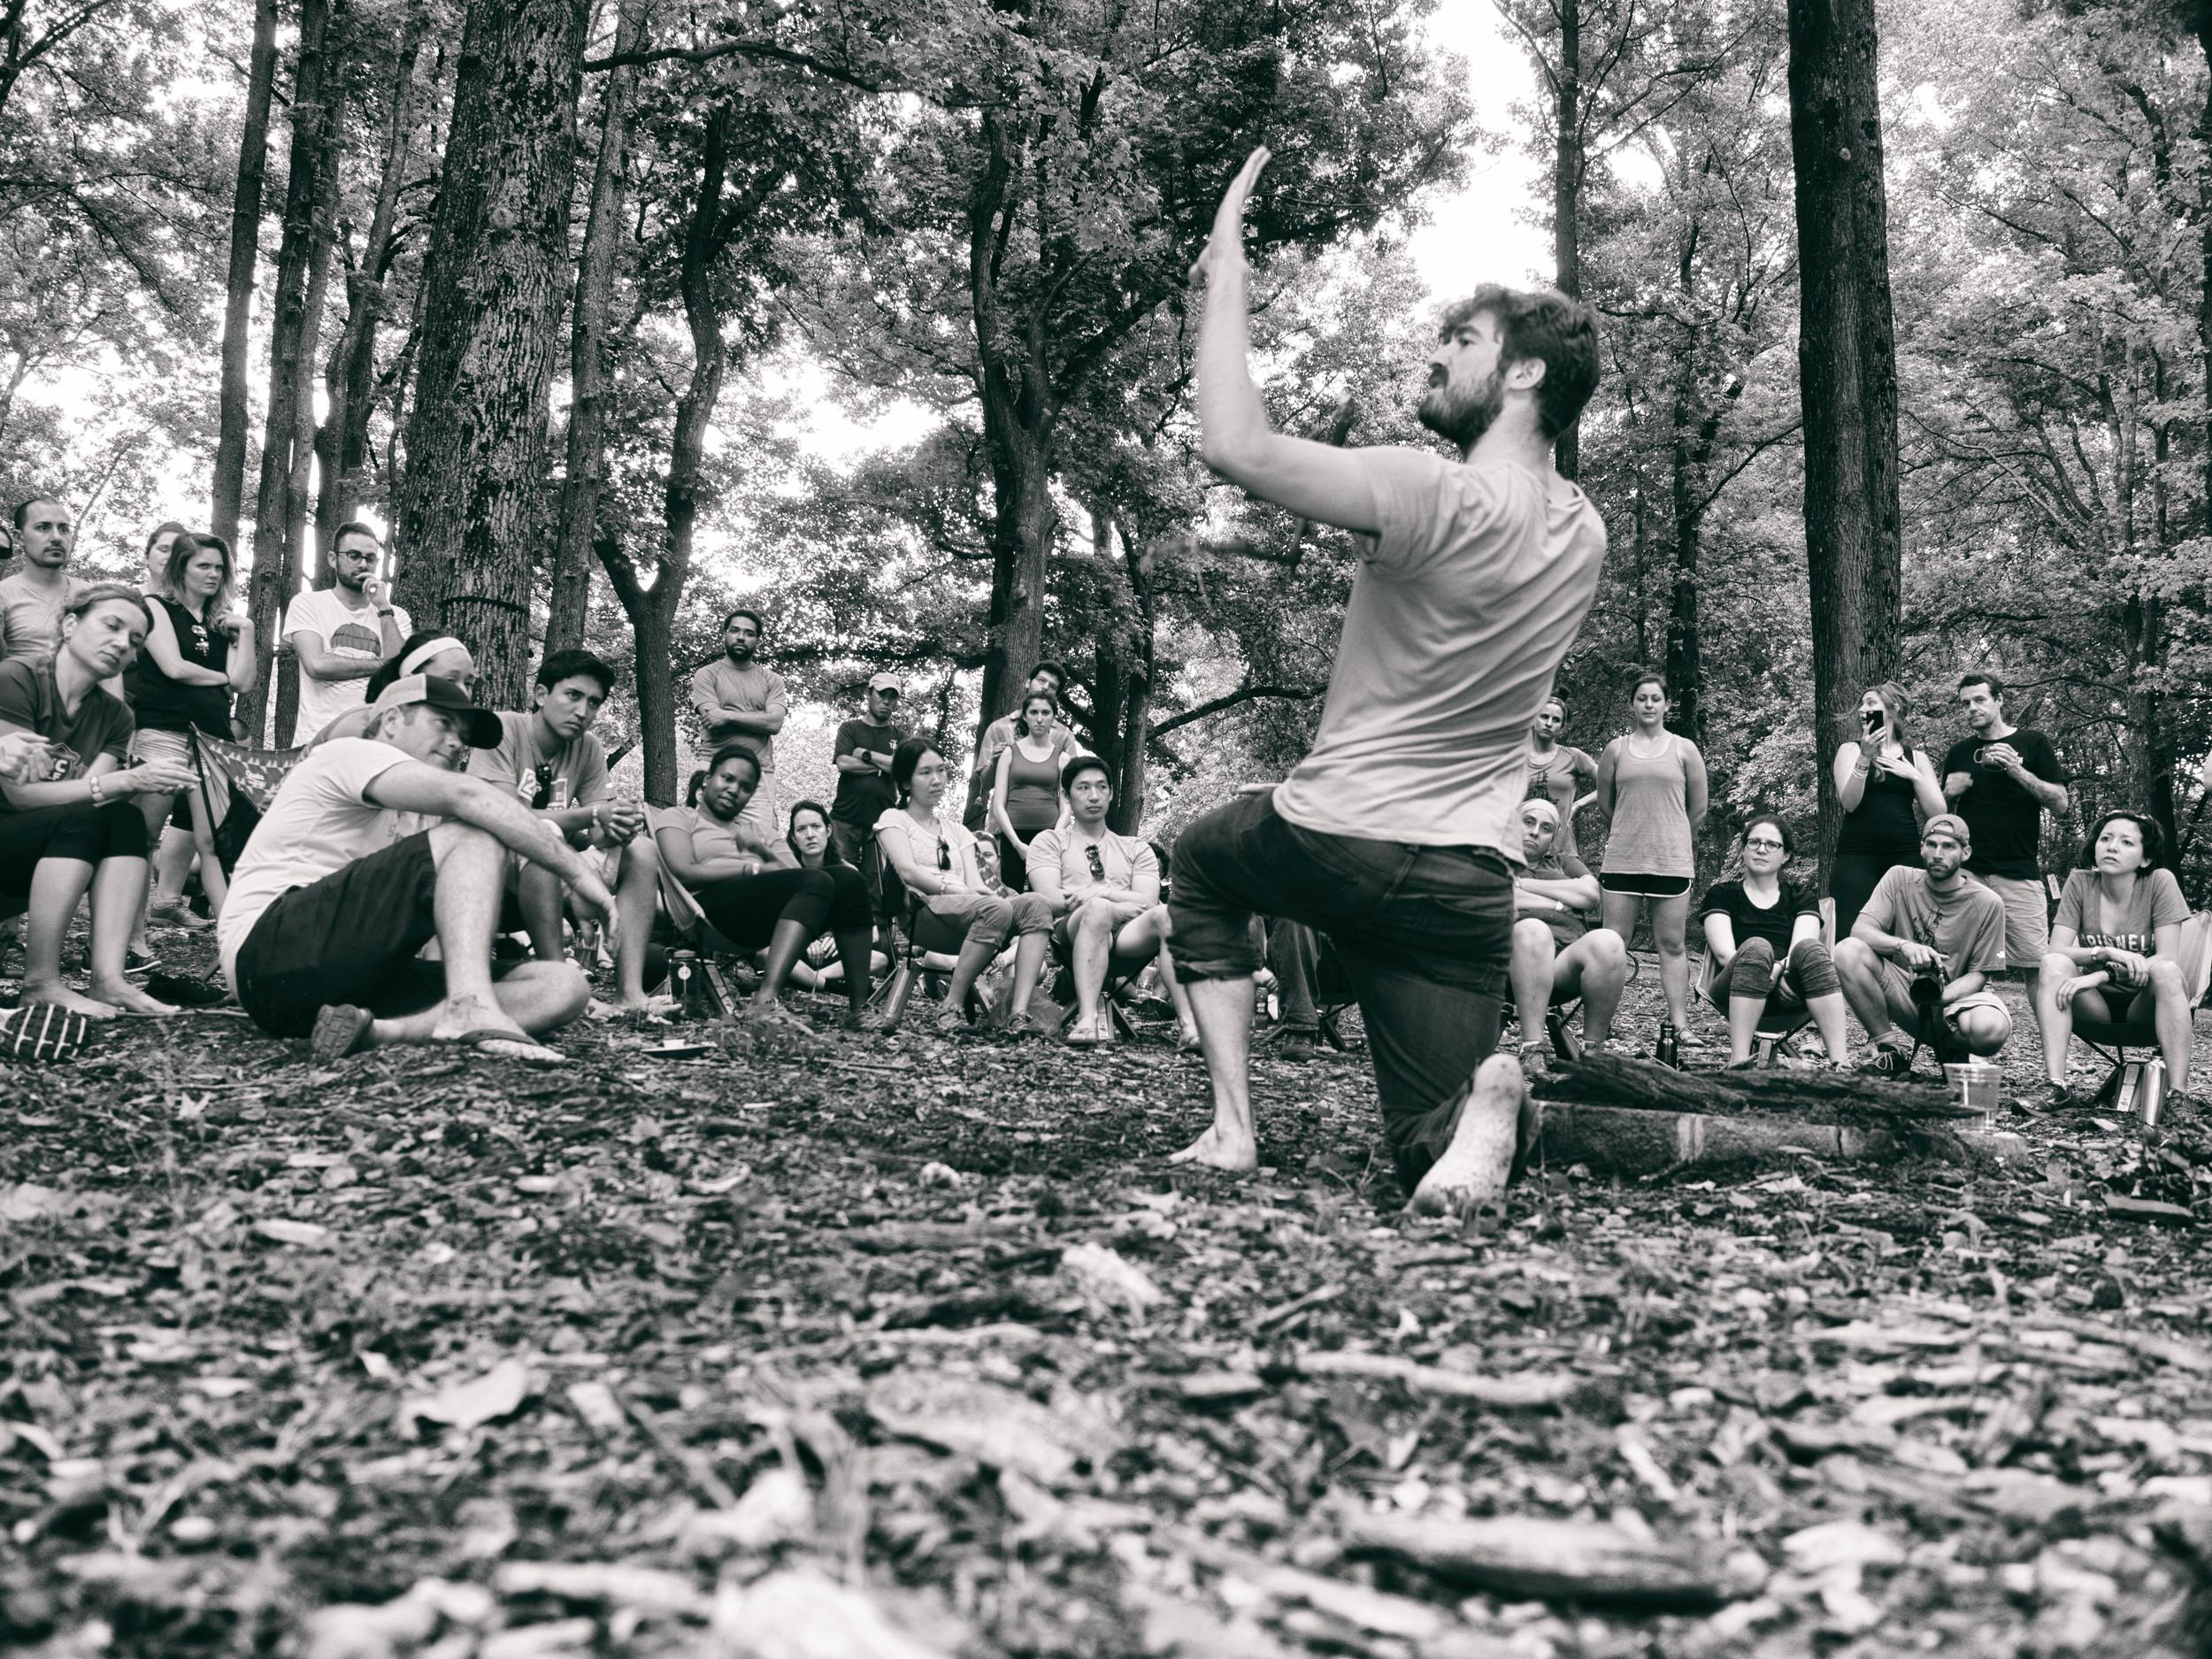 Rhett Godfrey teaches his fire by friction class. Photo by Tom O'Hare.